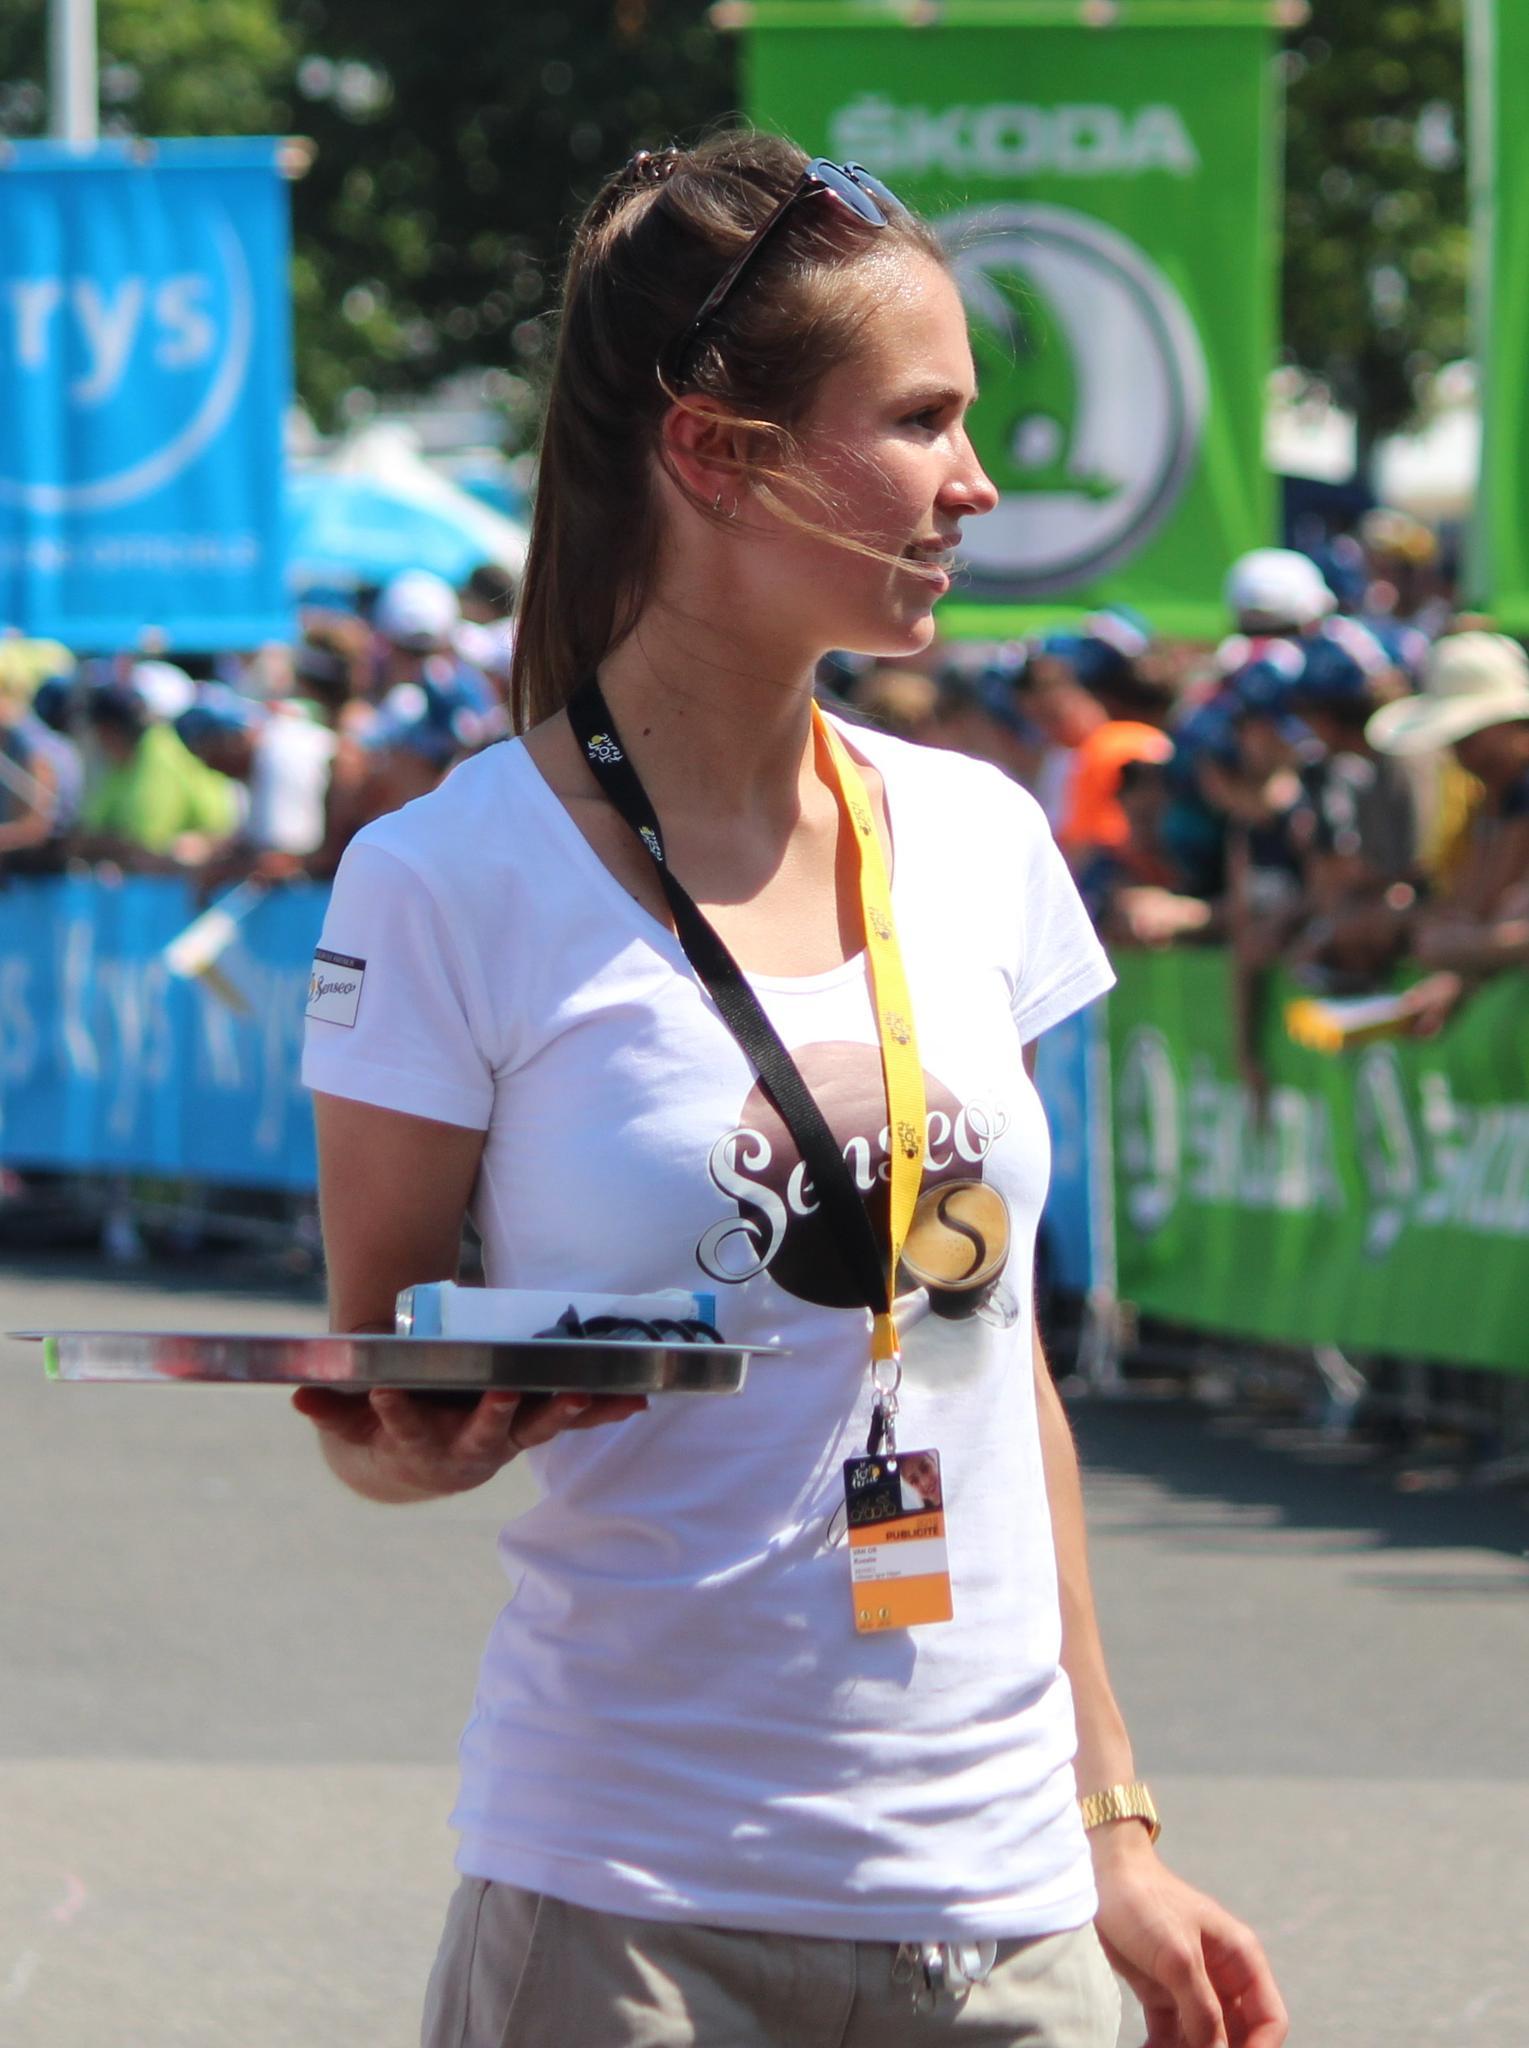 Start Tour de France in Utrecht 10 by H.Boorsma